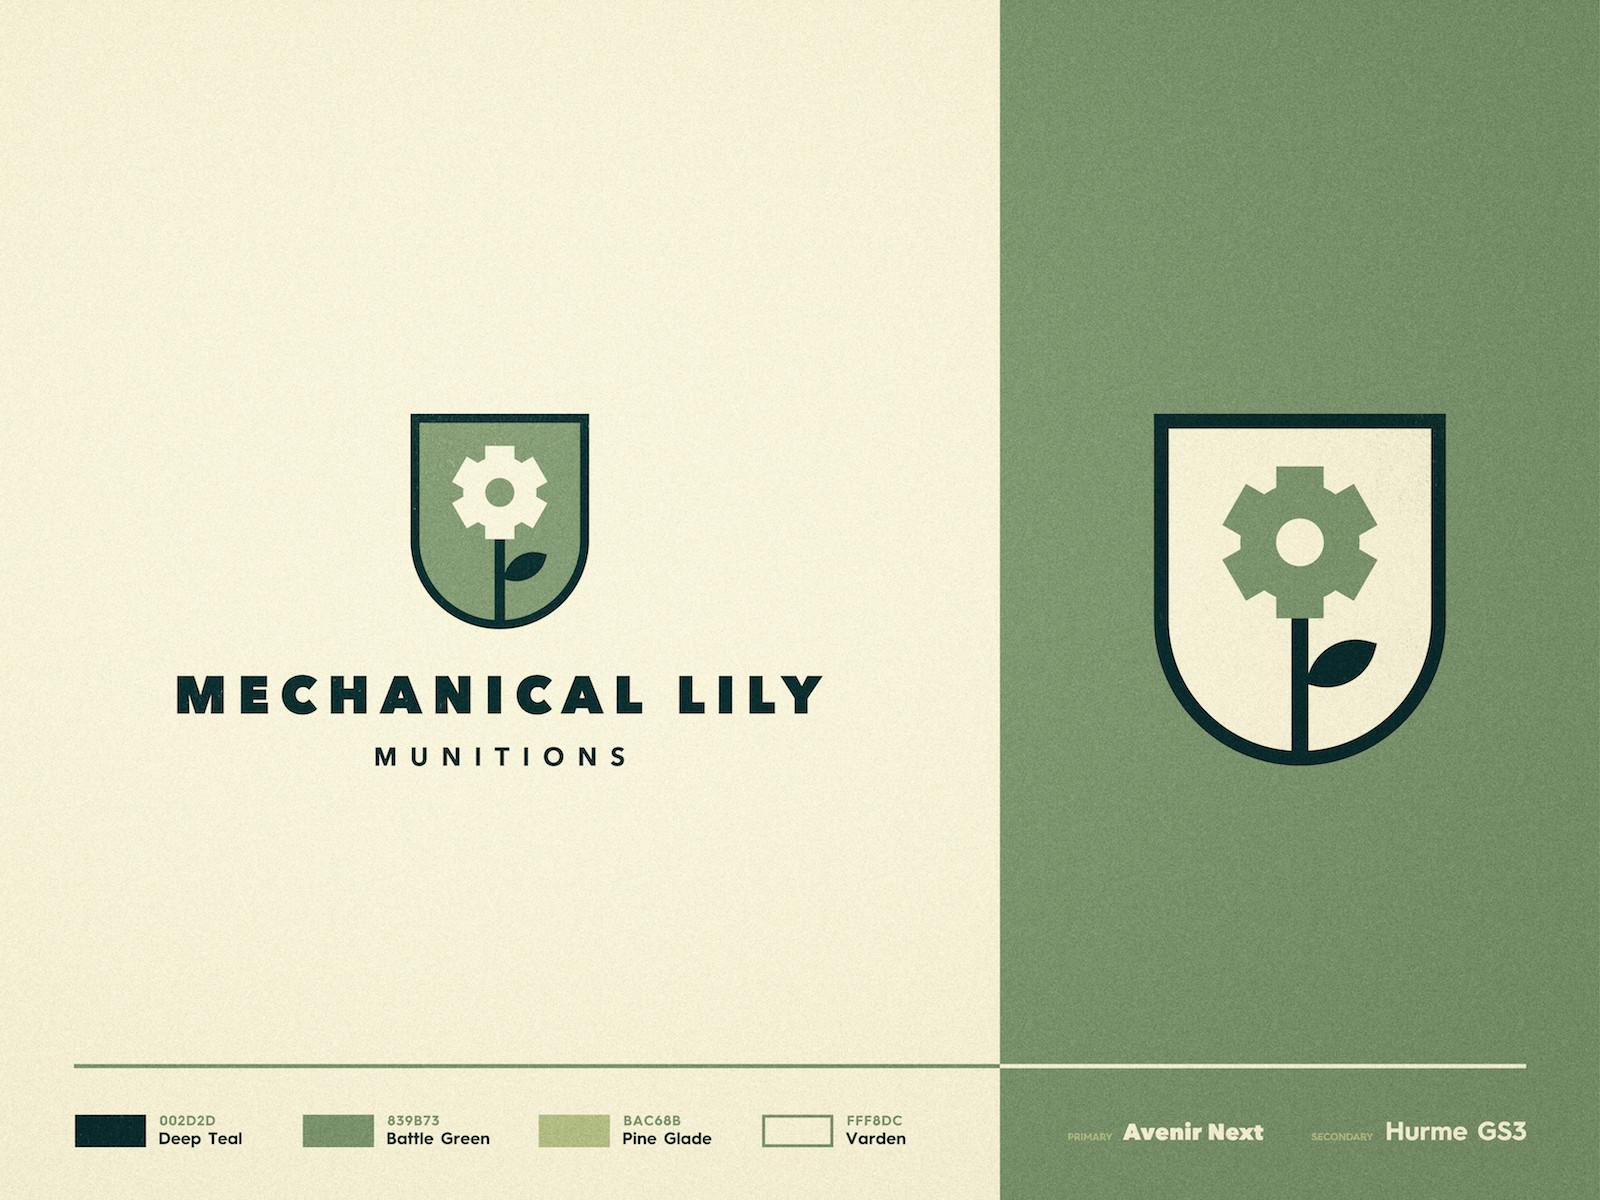 Mechanical lily drib 01